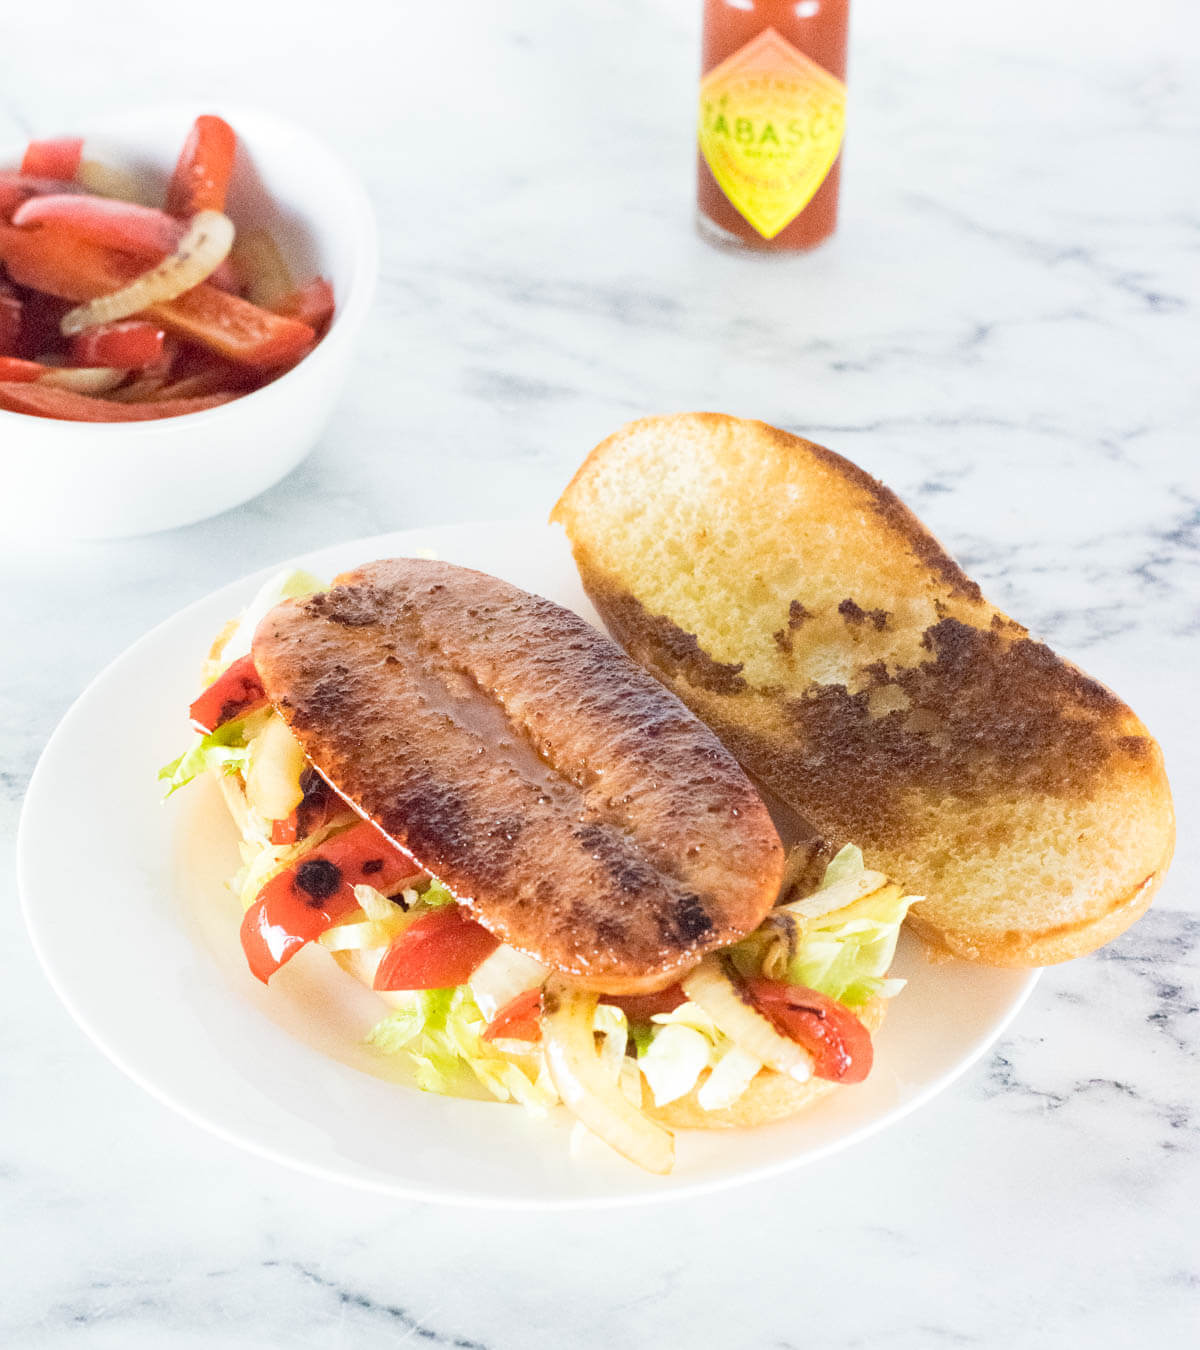 Split andouille sausage on hoagie roll